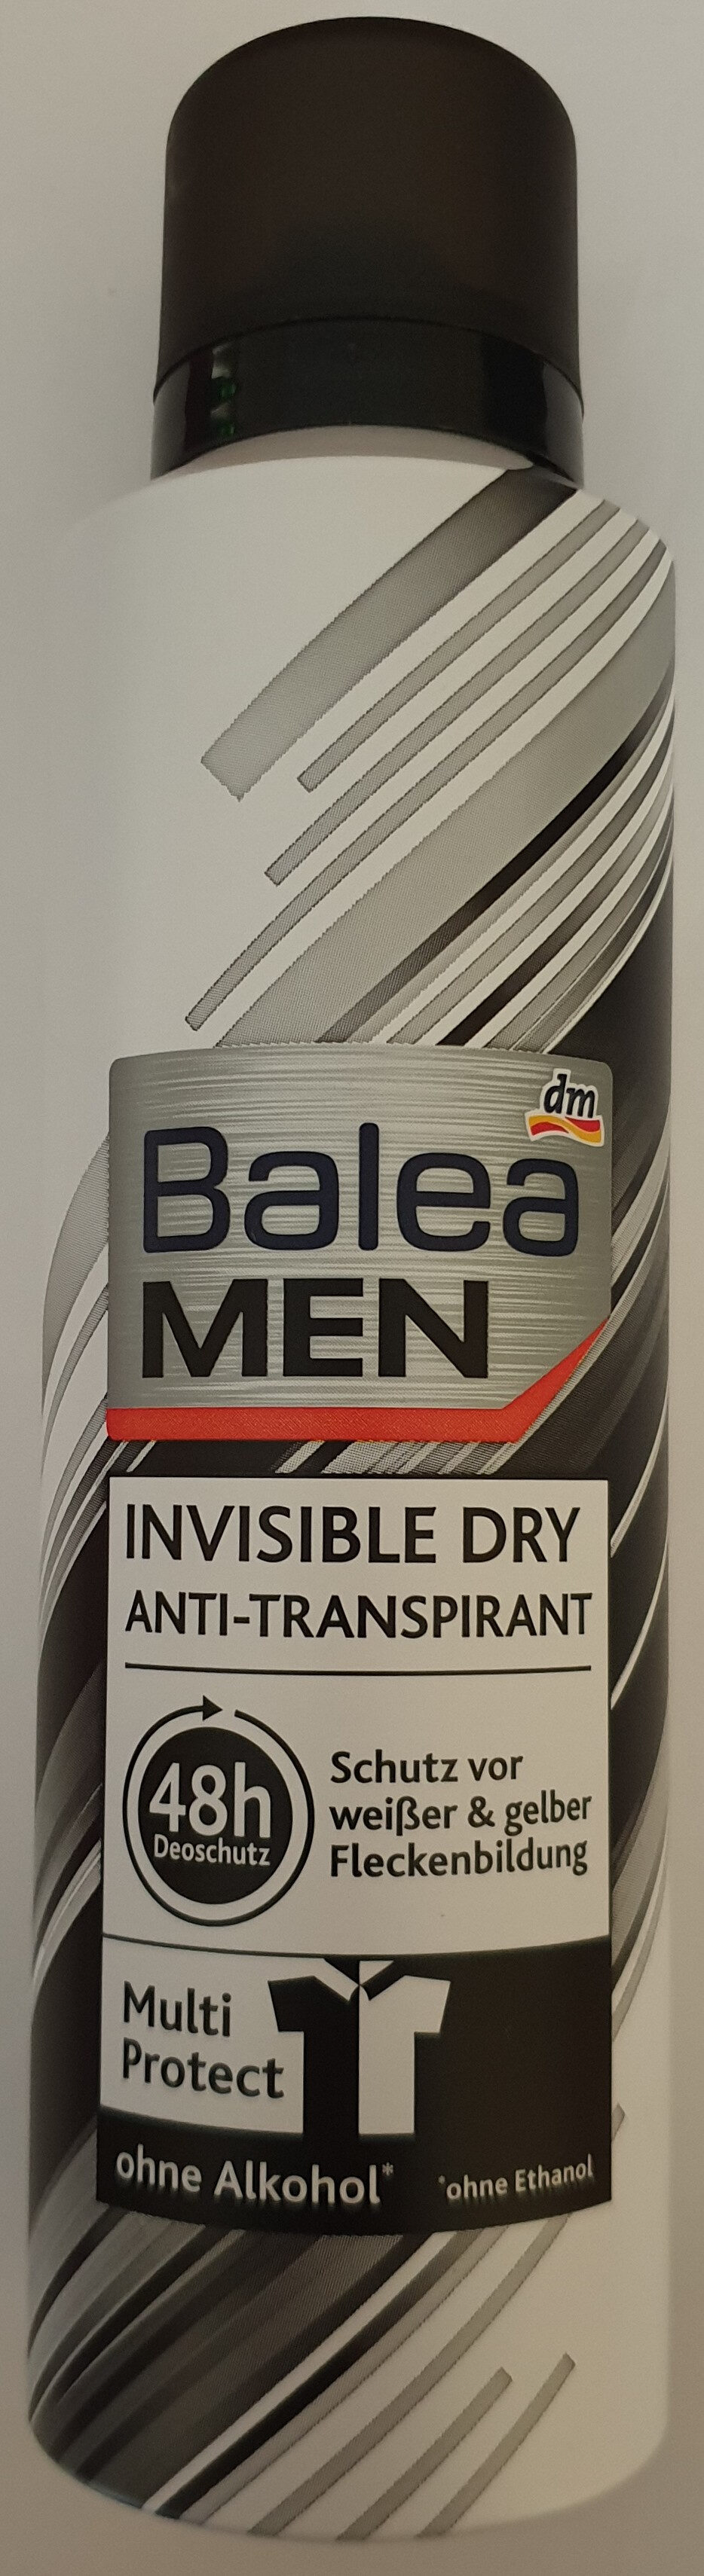 Invisible Dry anti-transpirant - Produit - de